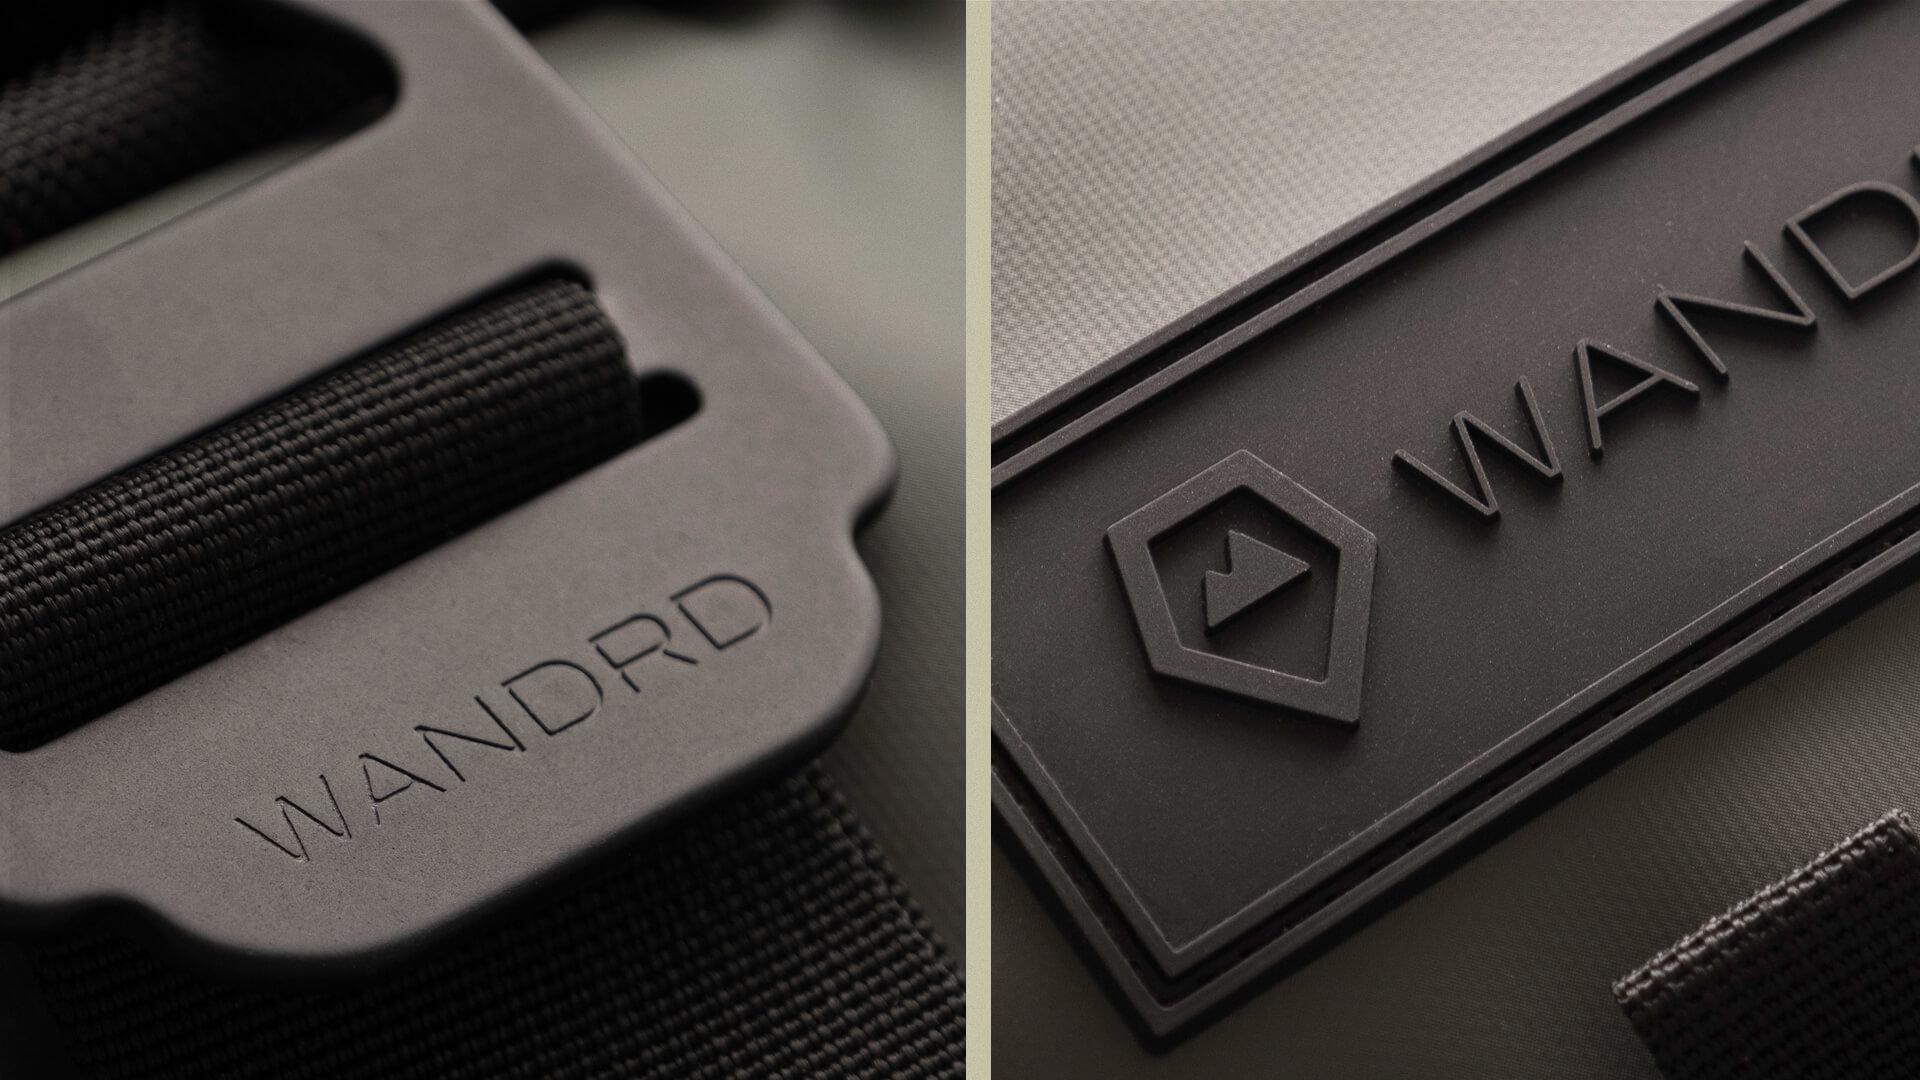 Branding on bag - Wandrd